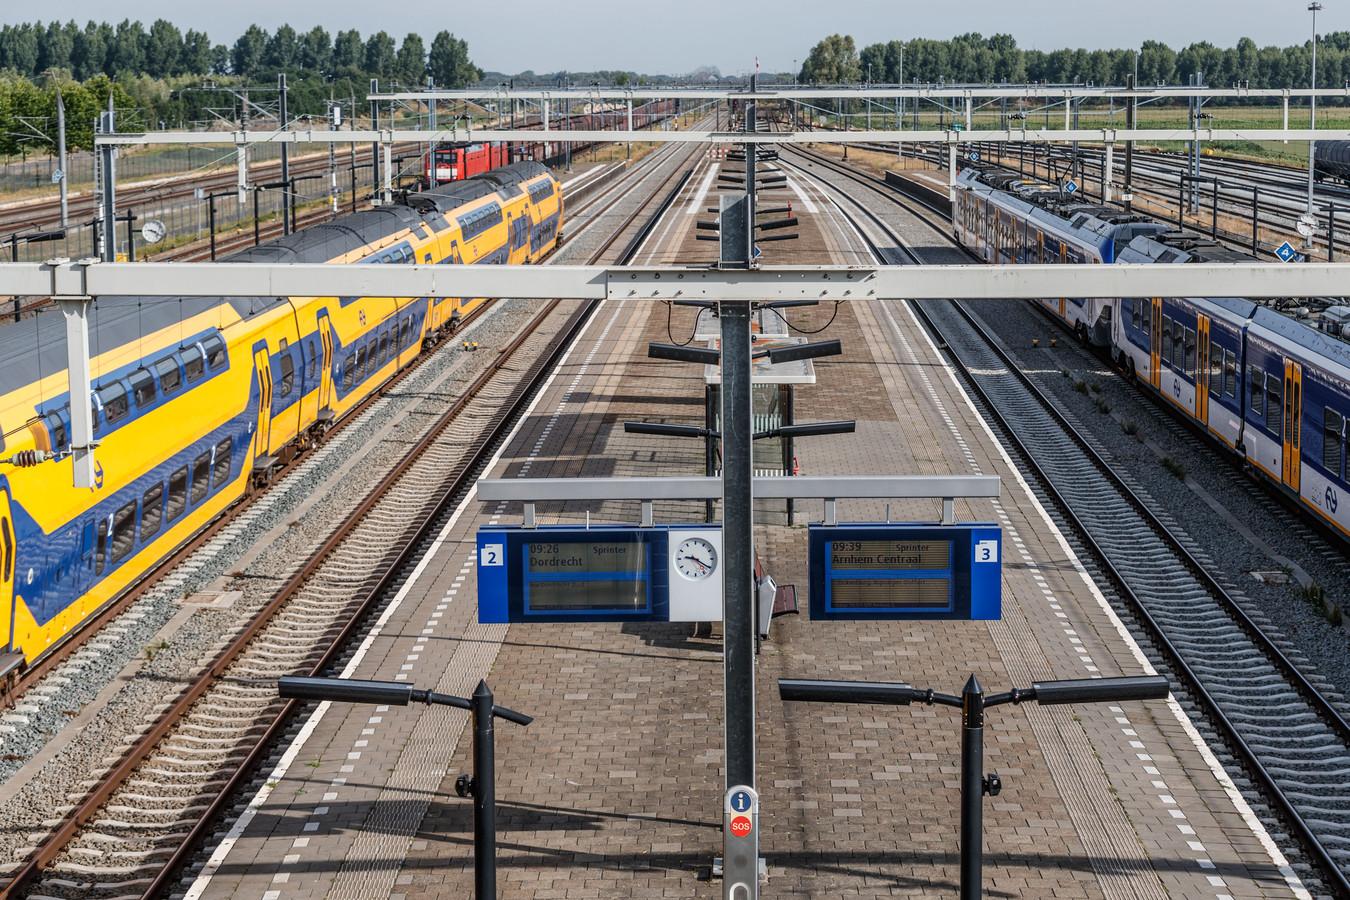 Zevenbergschen Hoek - 18-7-2018 - Foto: Marcel Otterspeer / Pix4Profs - Station Lage Zwaluwe